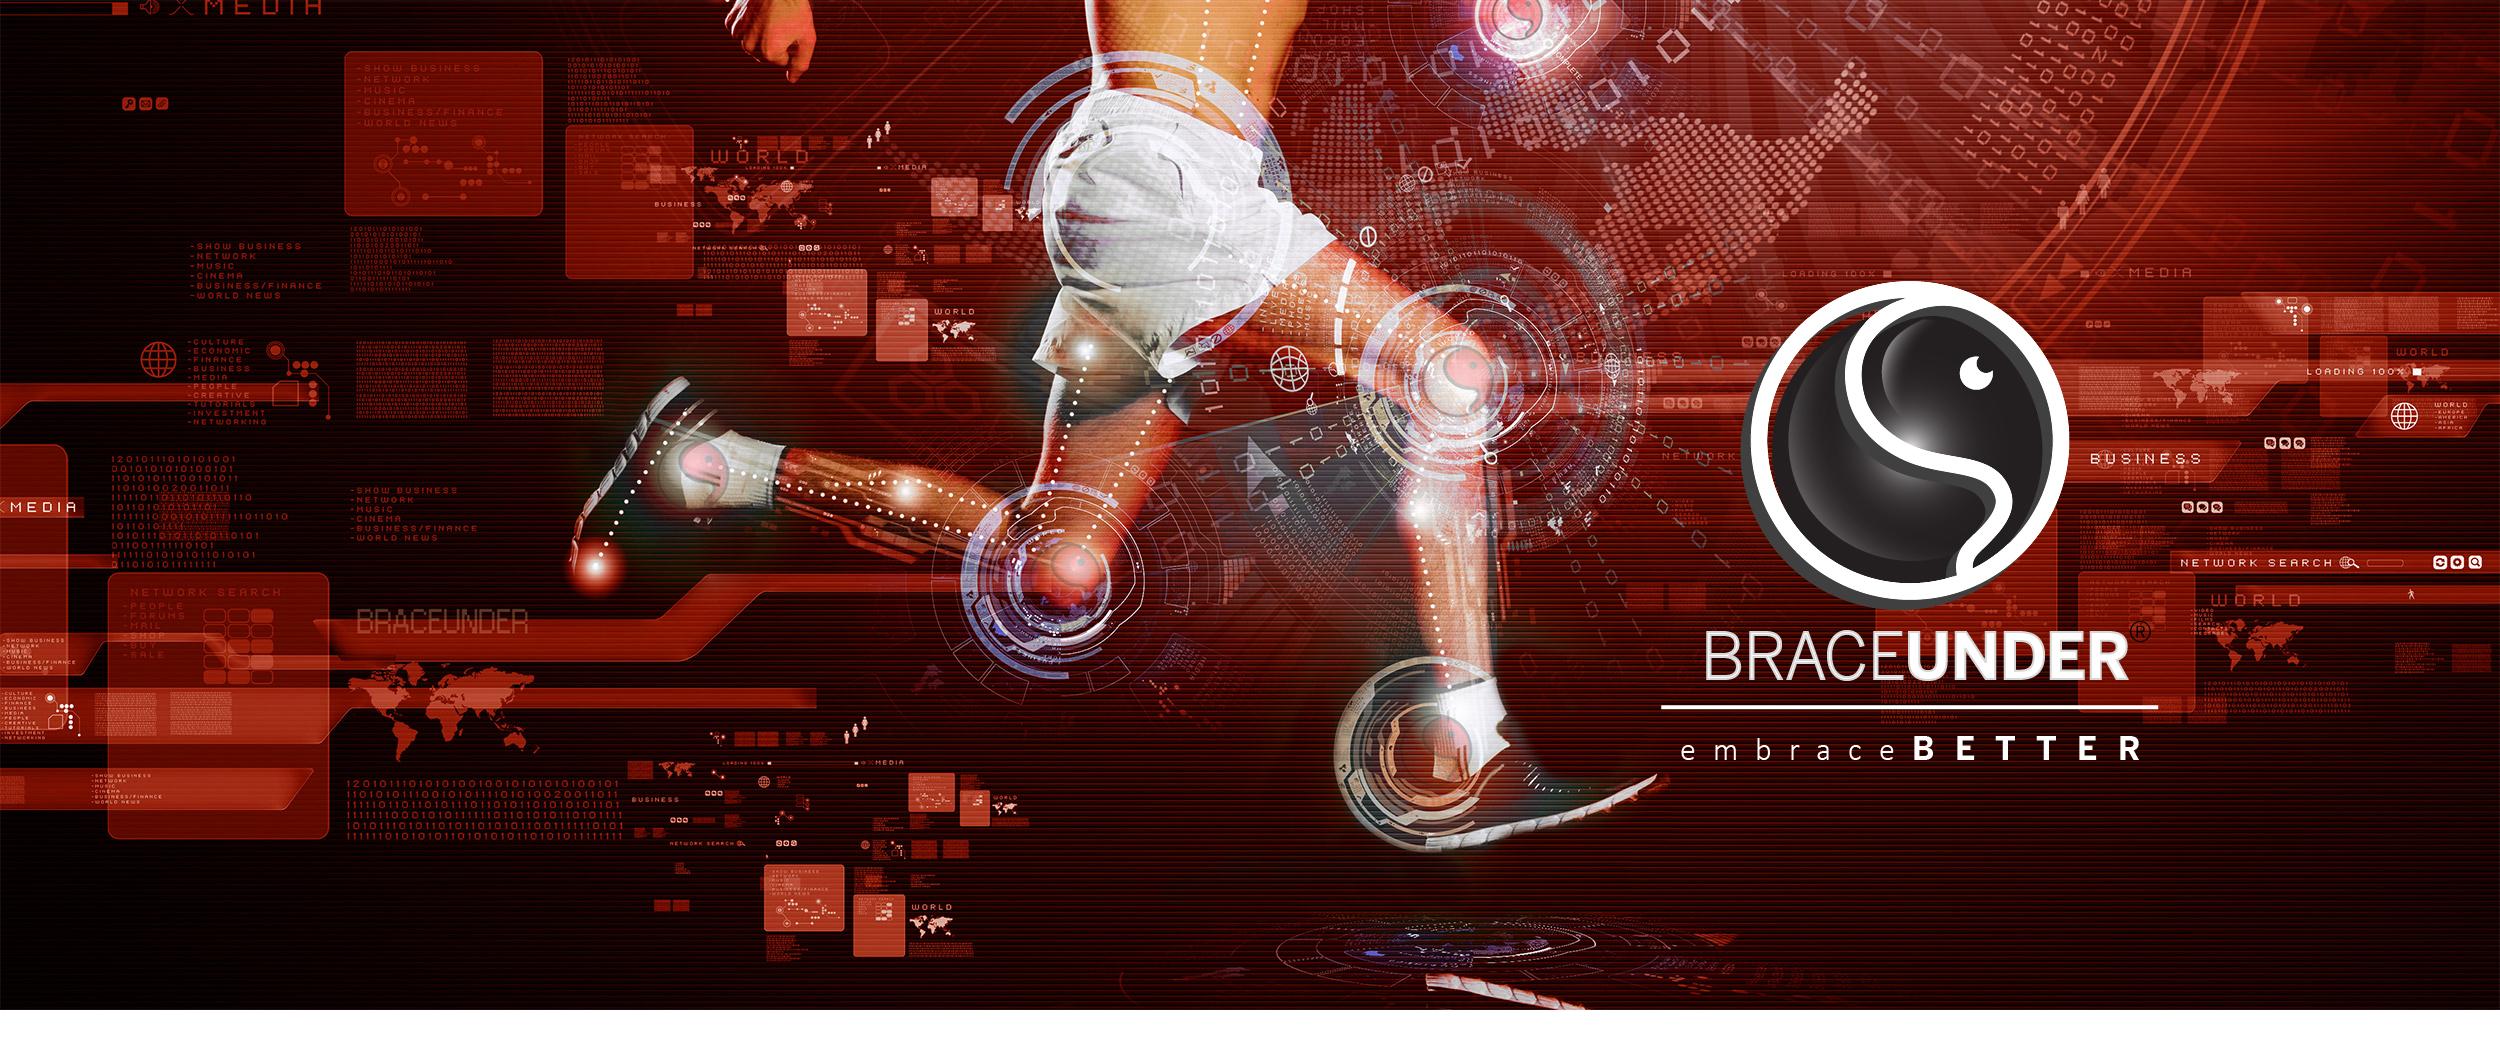 BraceUnder Technologies